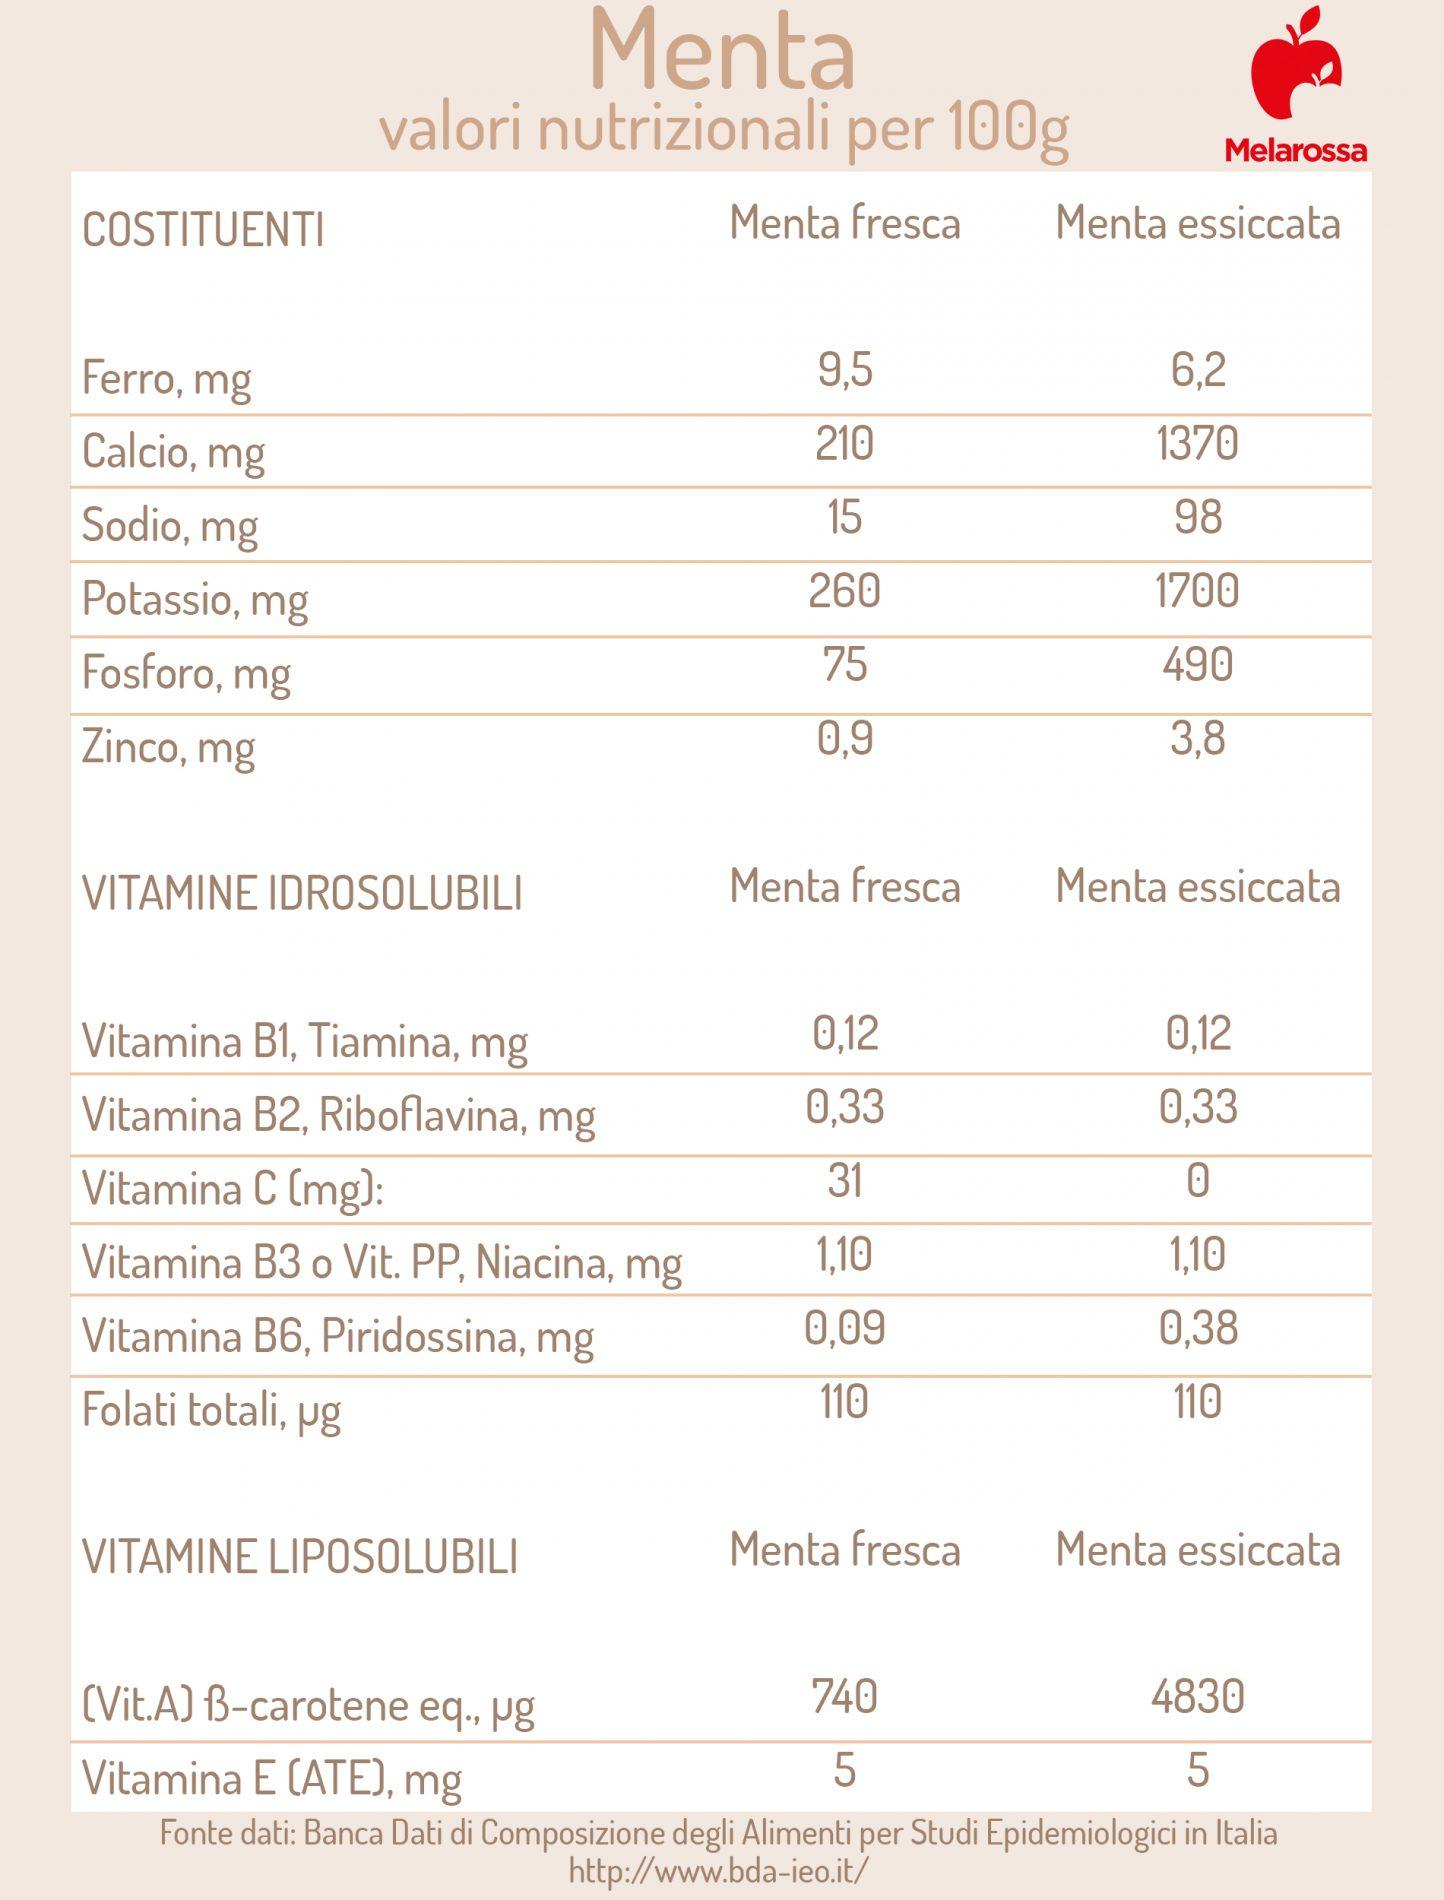 menta : valori nutrizionali